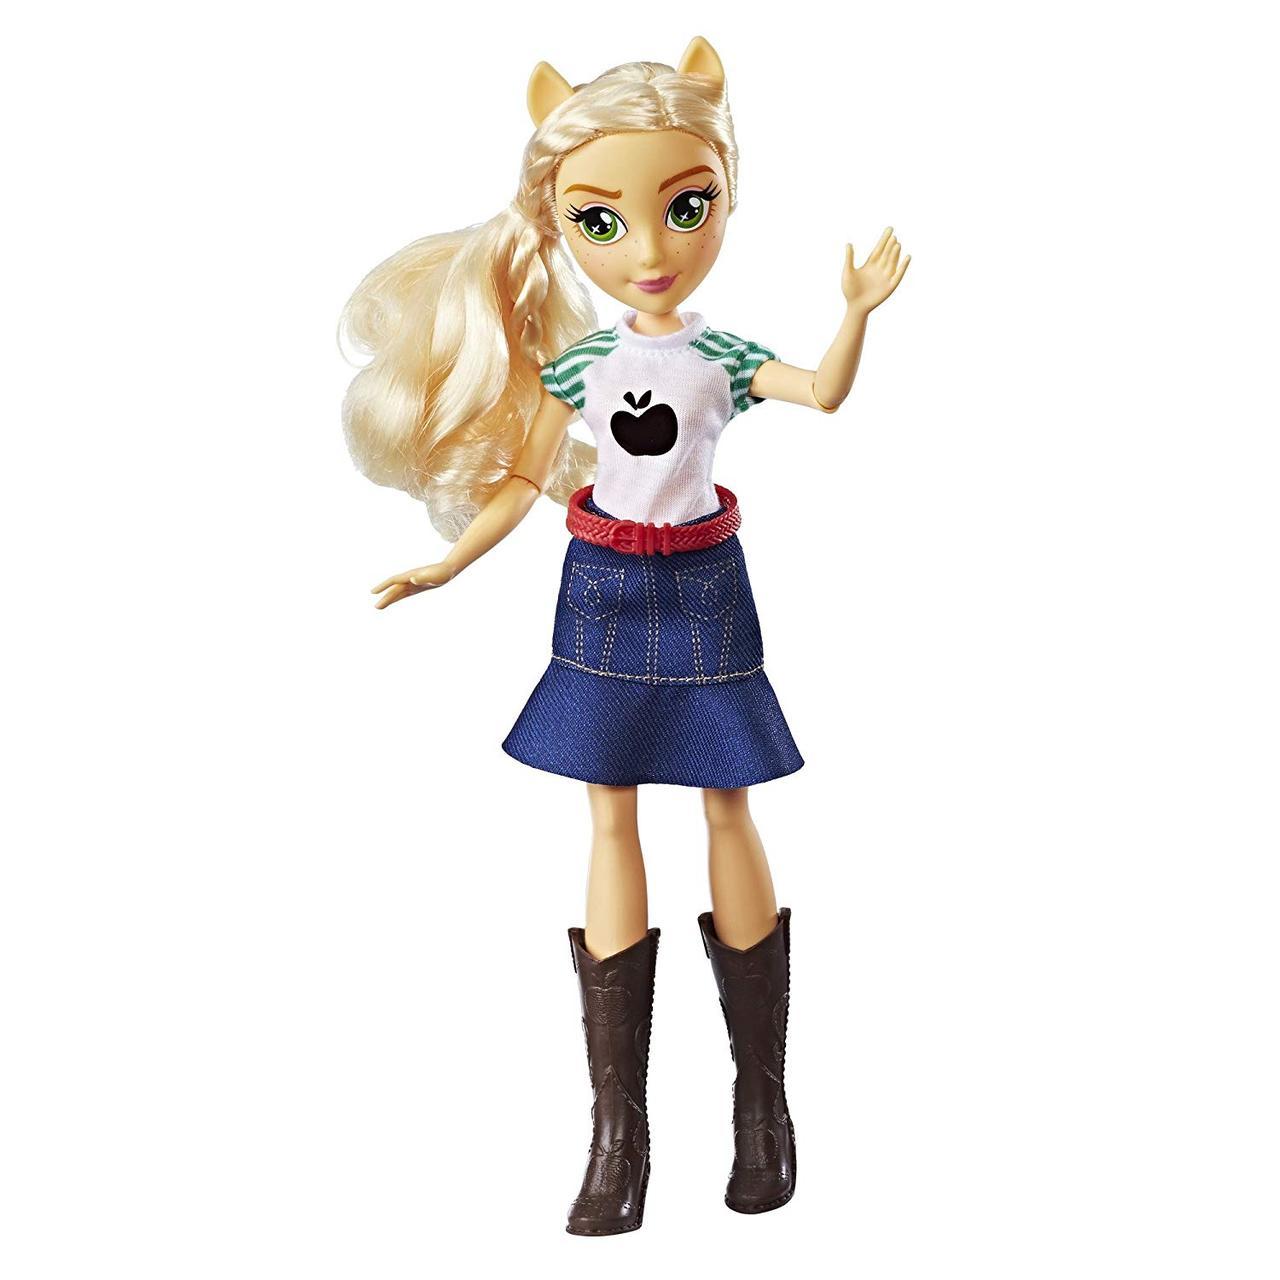 Кукла Пони Эпплджек Классический стиль My Little Pony Equestria Girls Applejack Classic Style